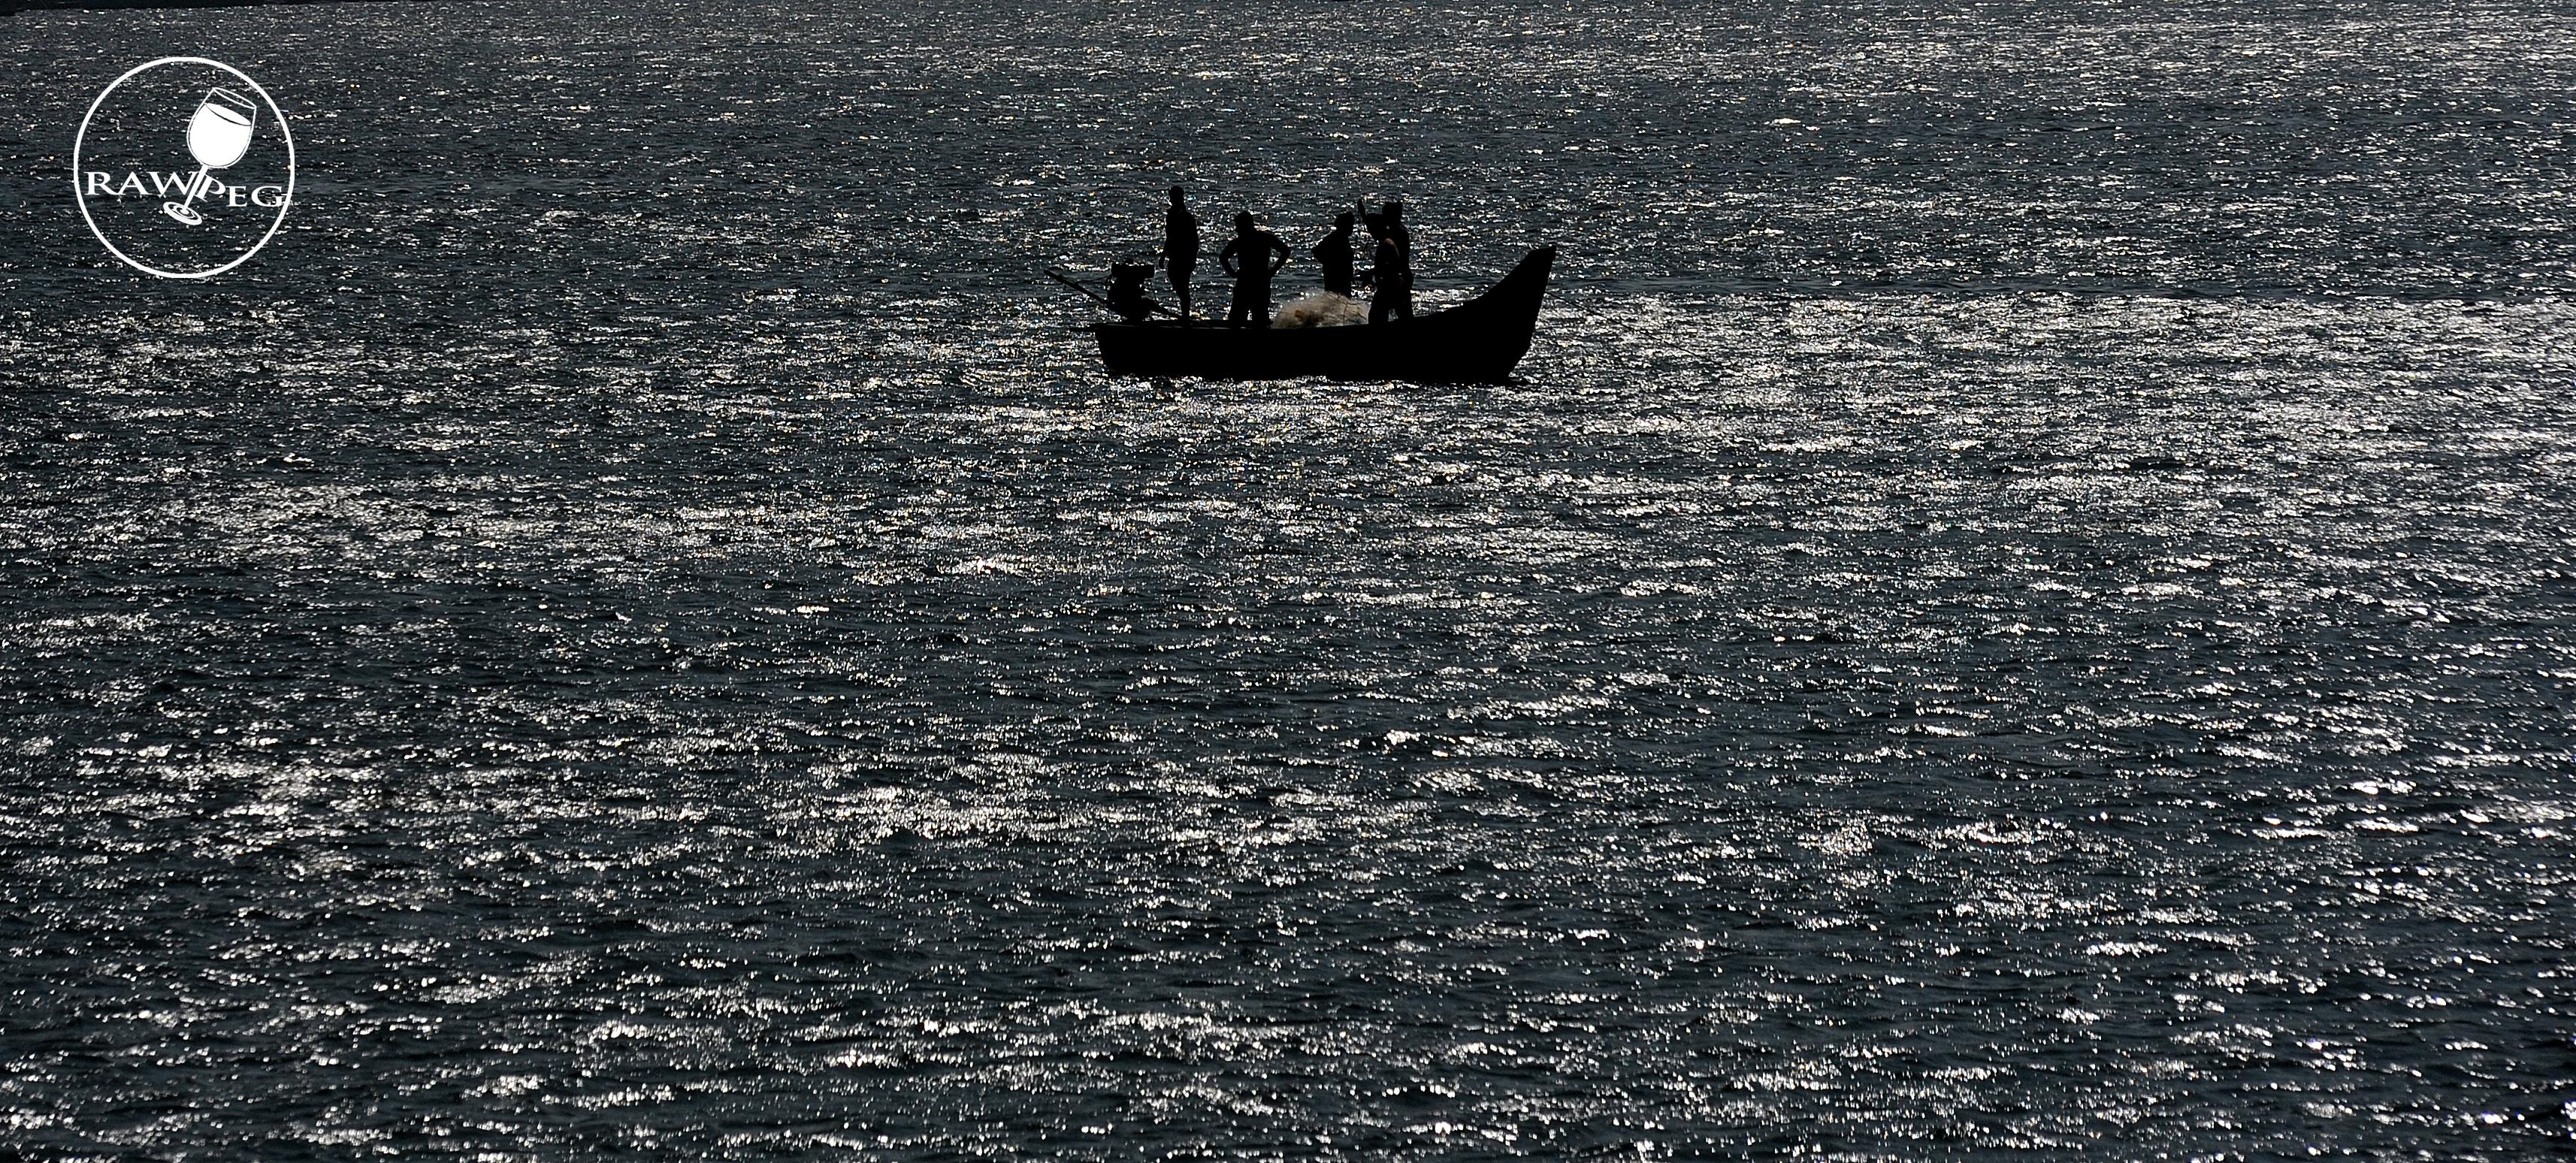 #rawpegstudio#fishermen